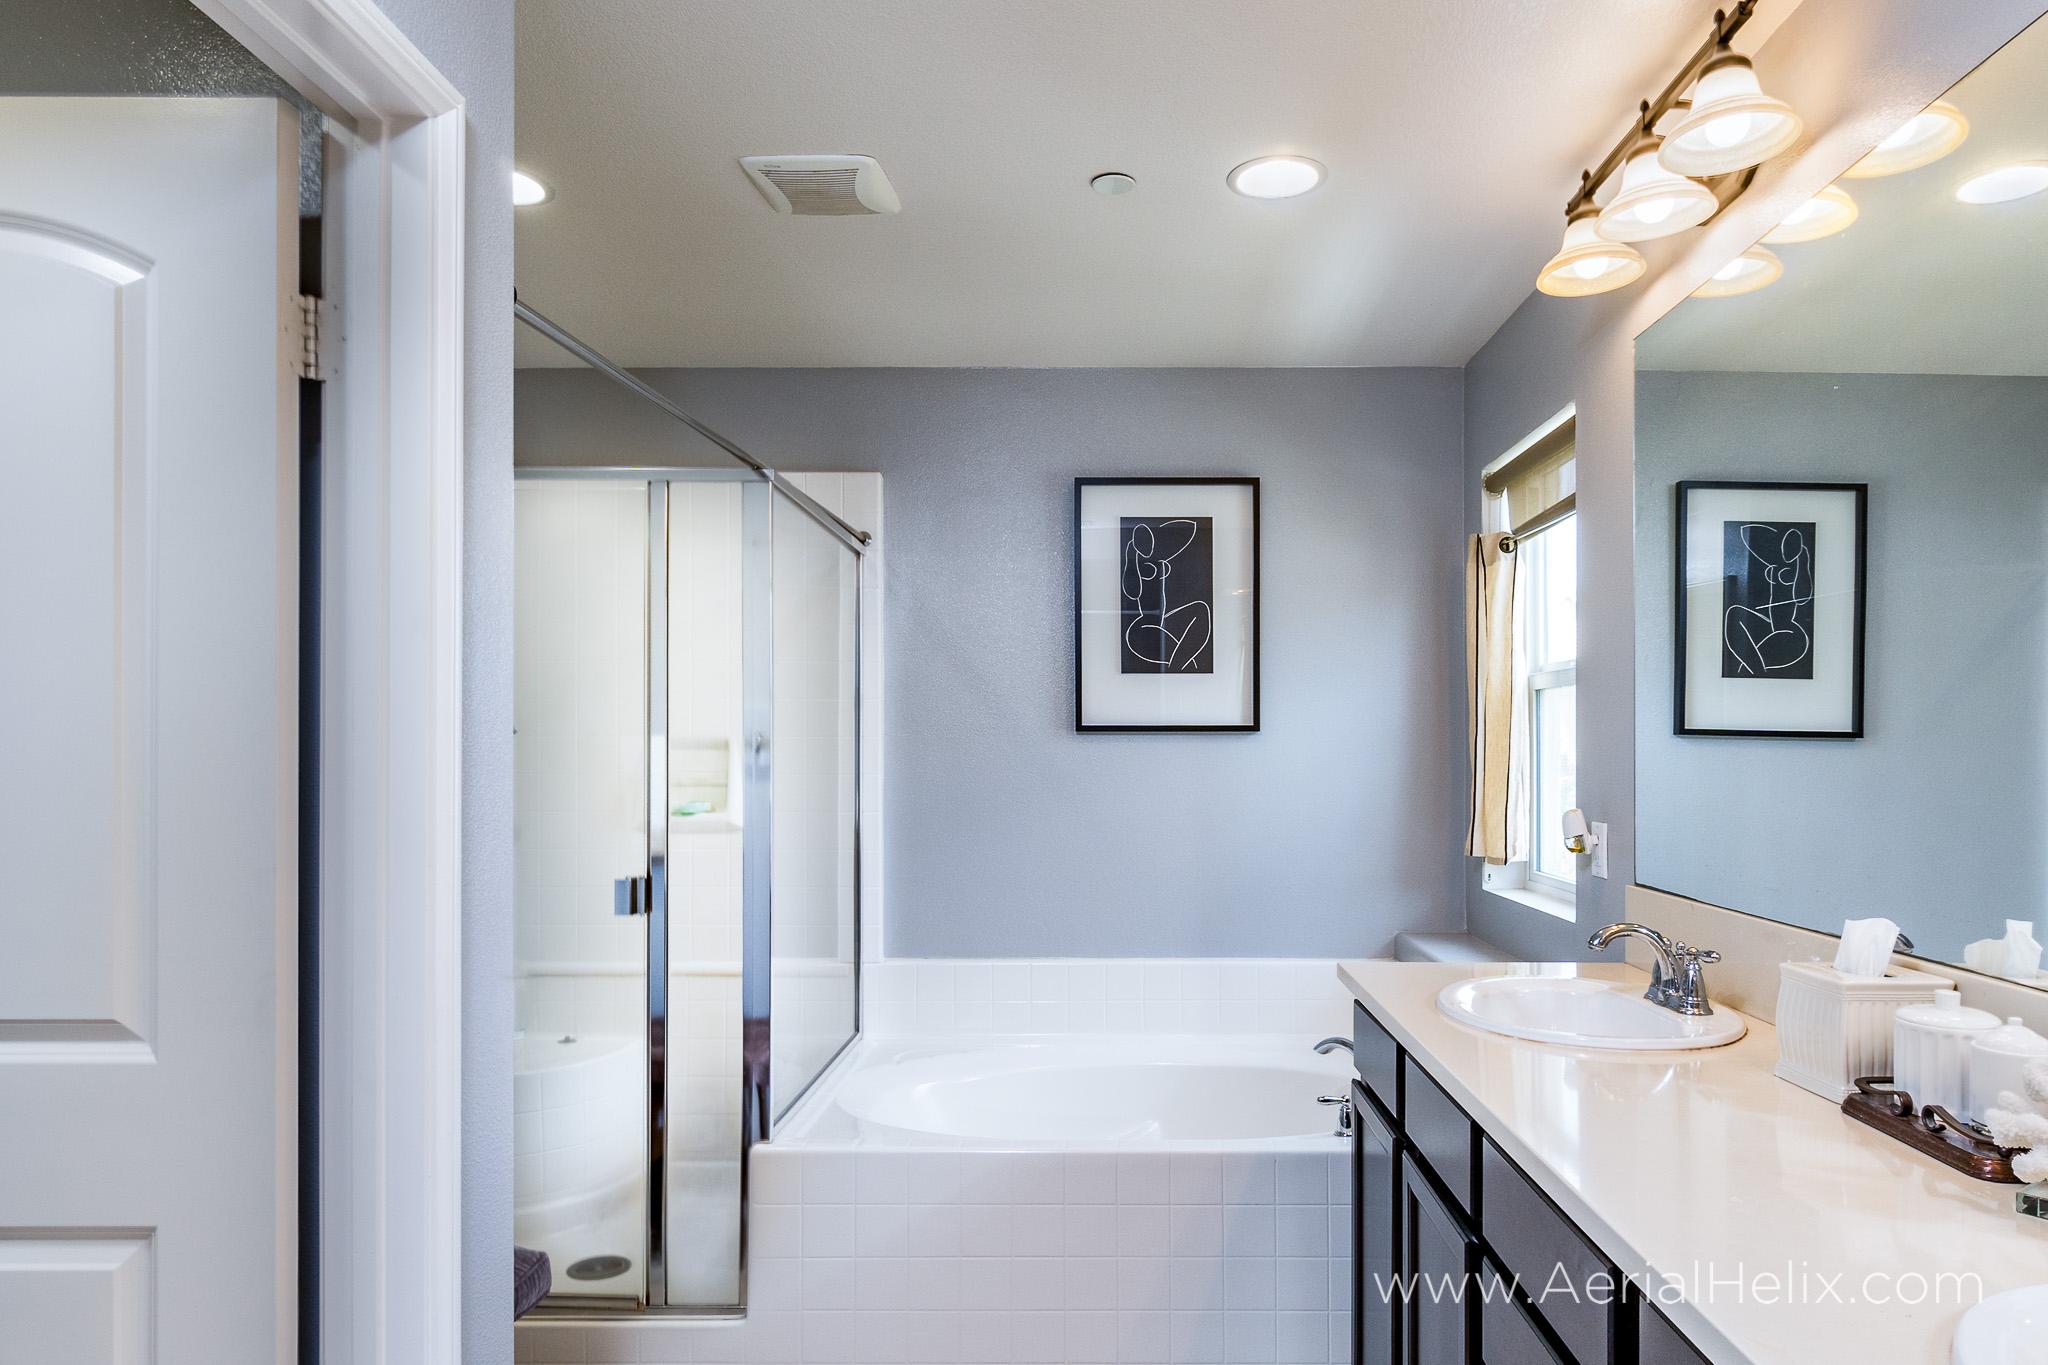 HELIX - bathrooom - real estate photography.jpg